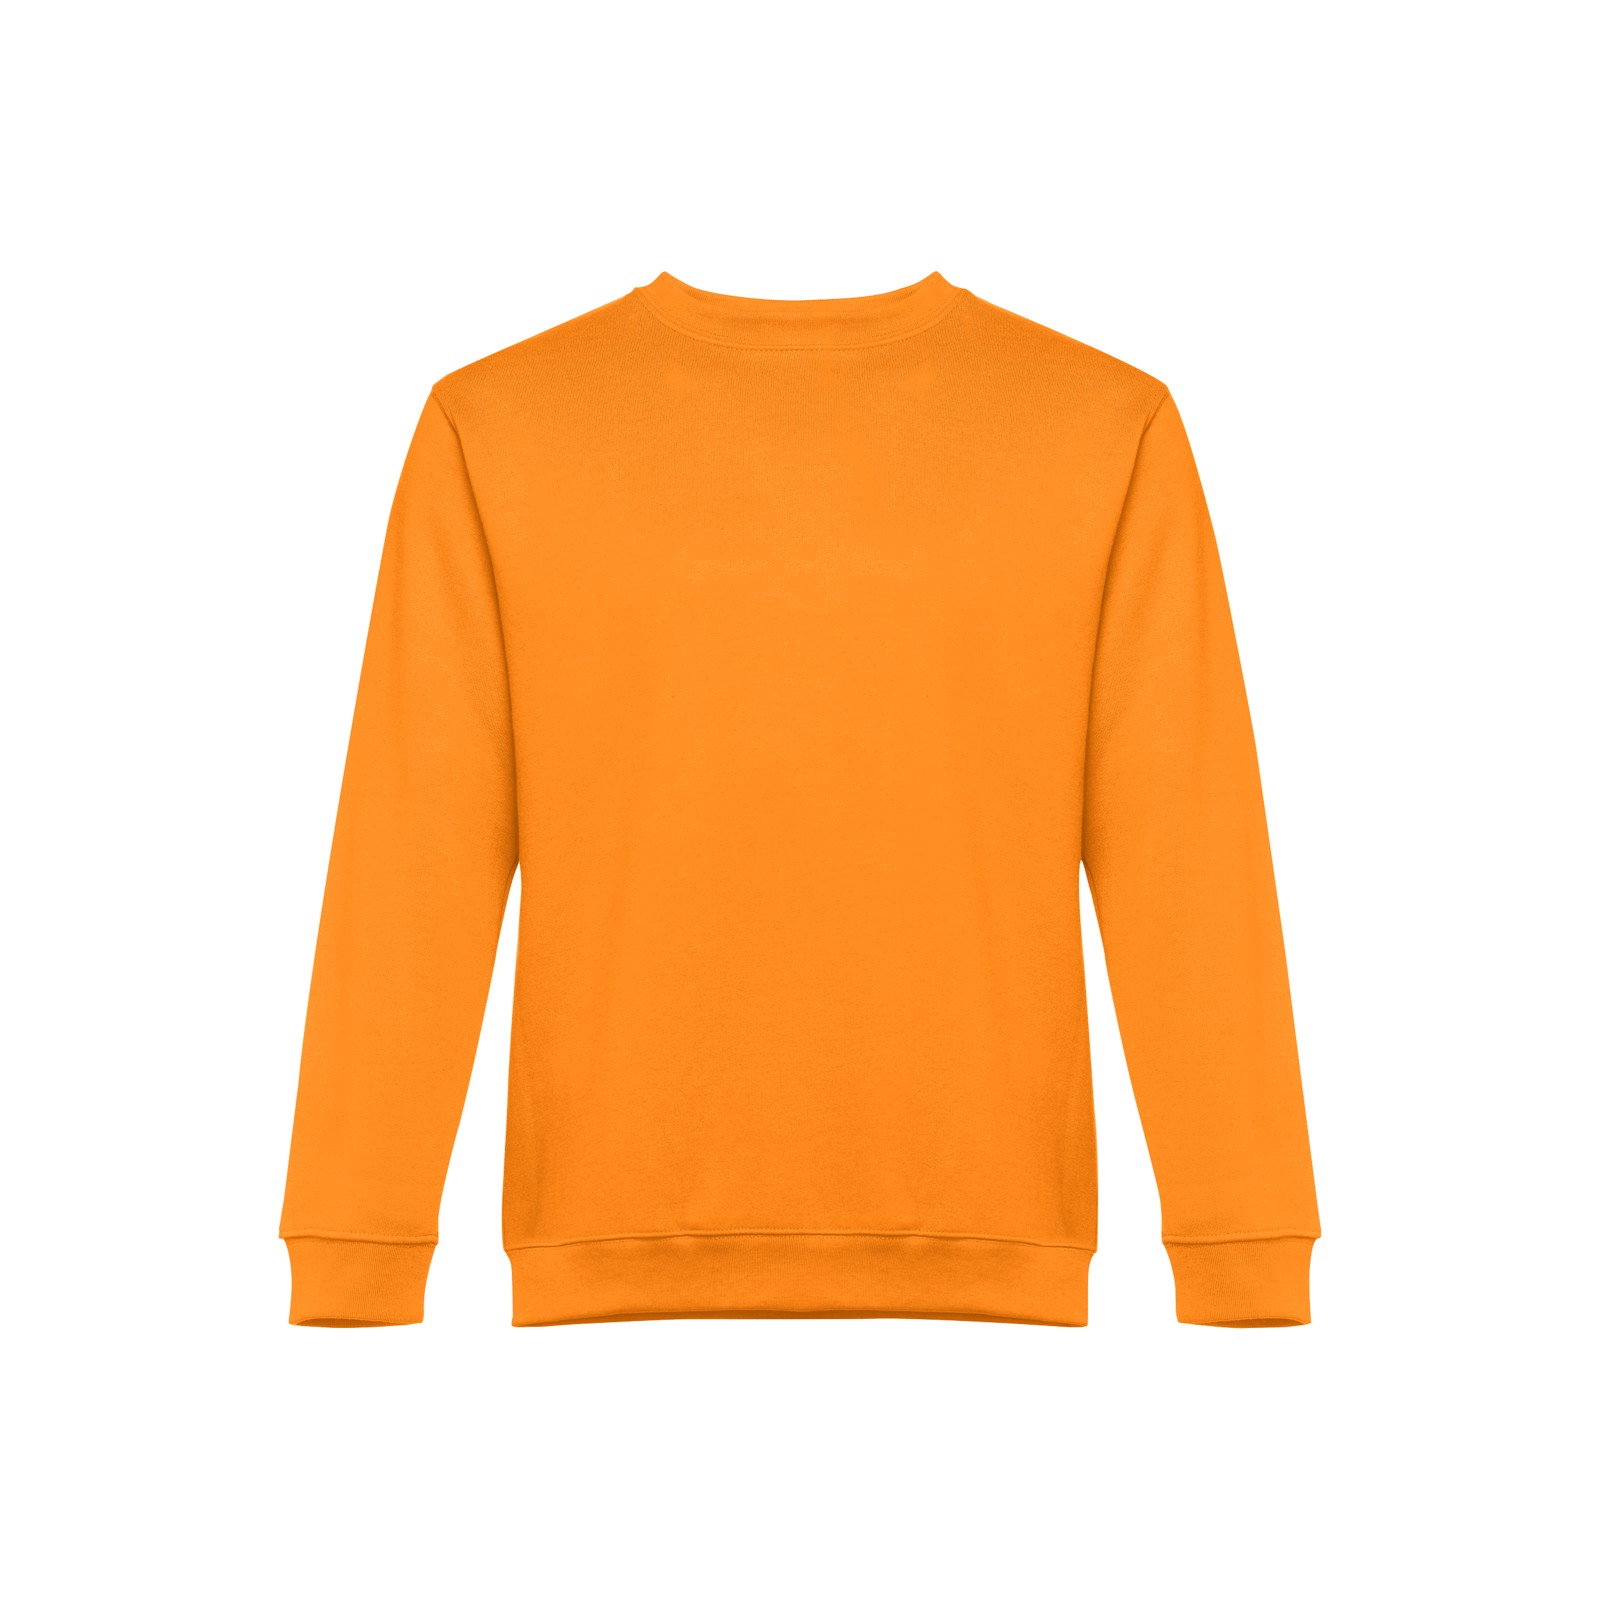 DELTA. Φούτερ Unisex - Πορτοκάλι / L